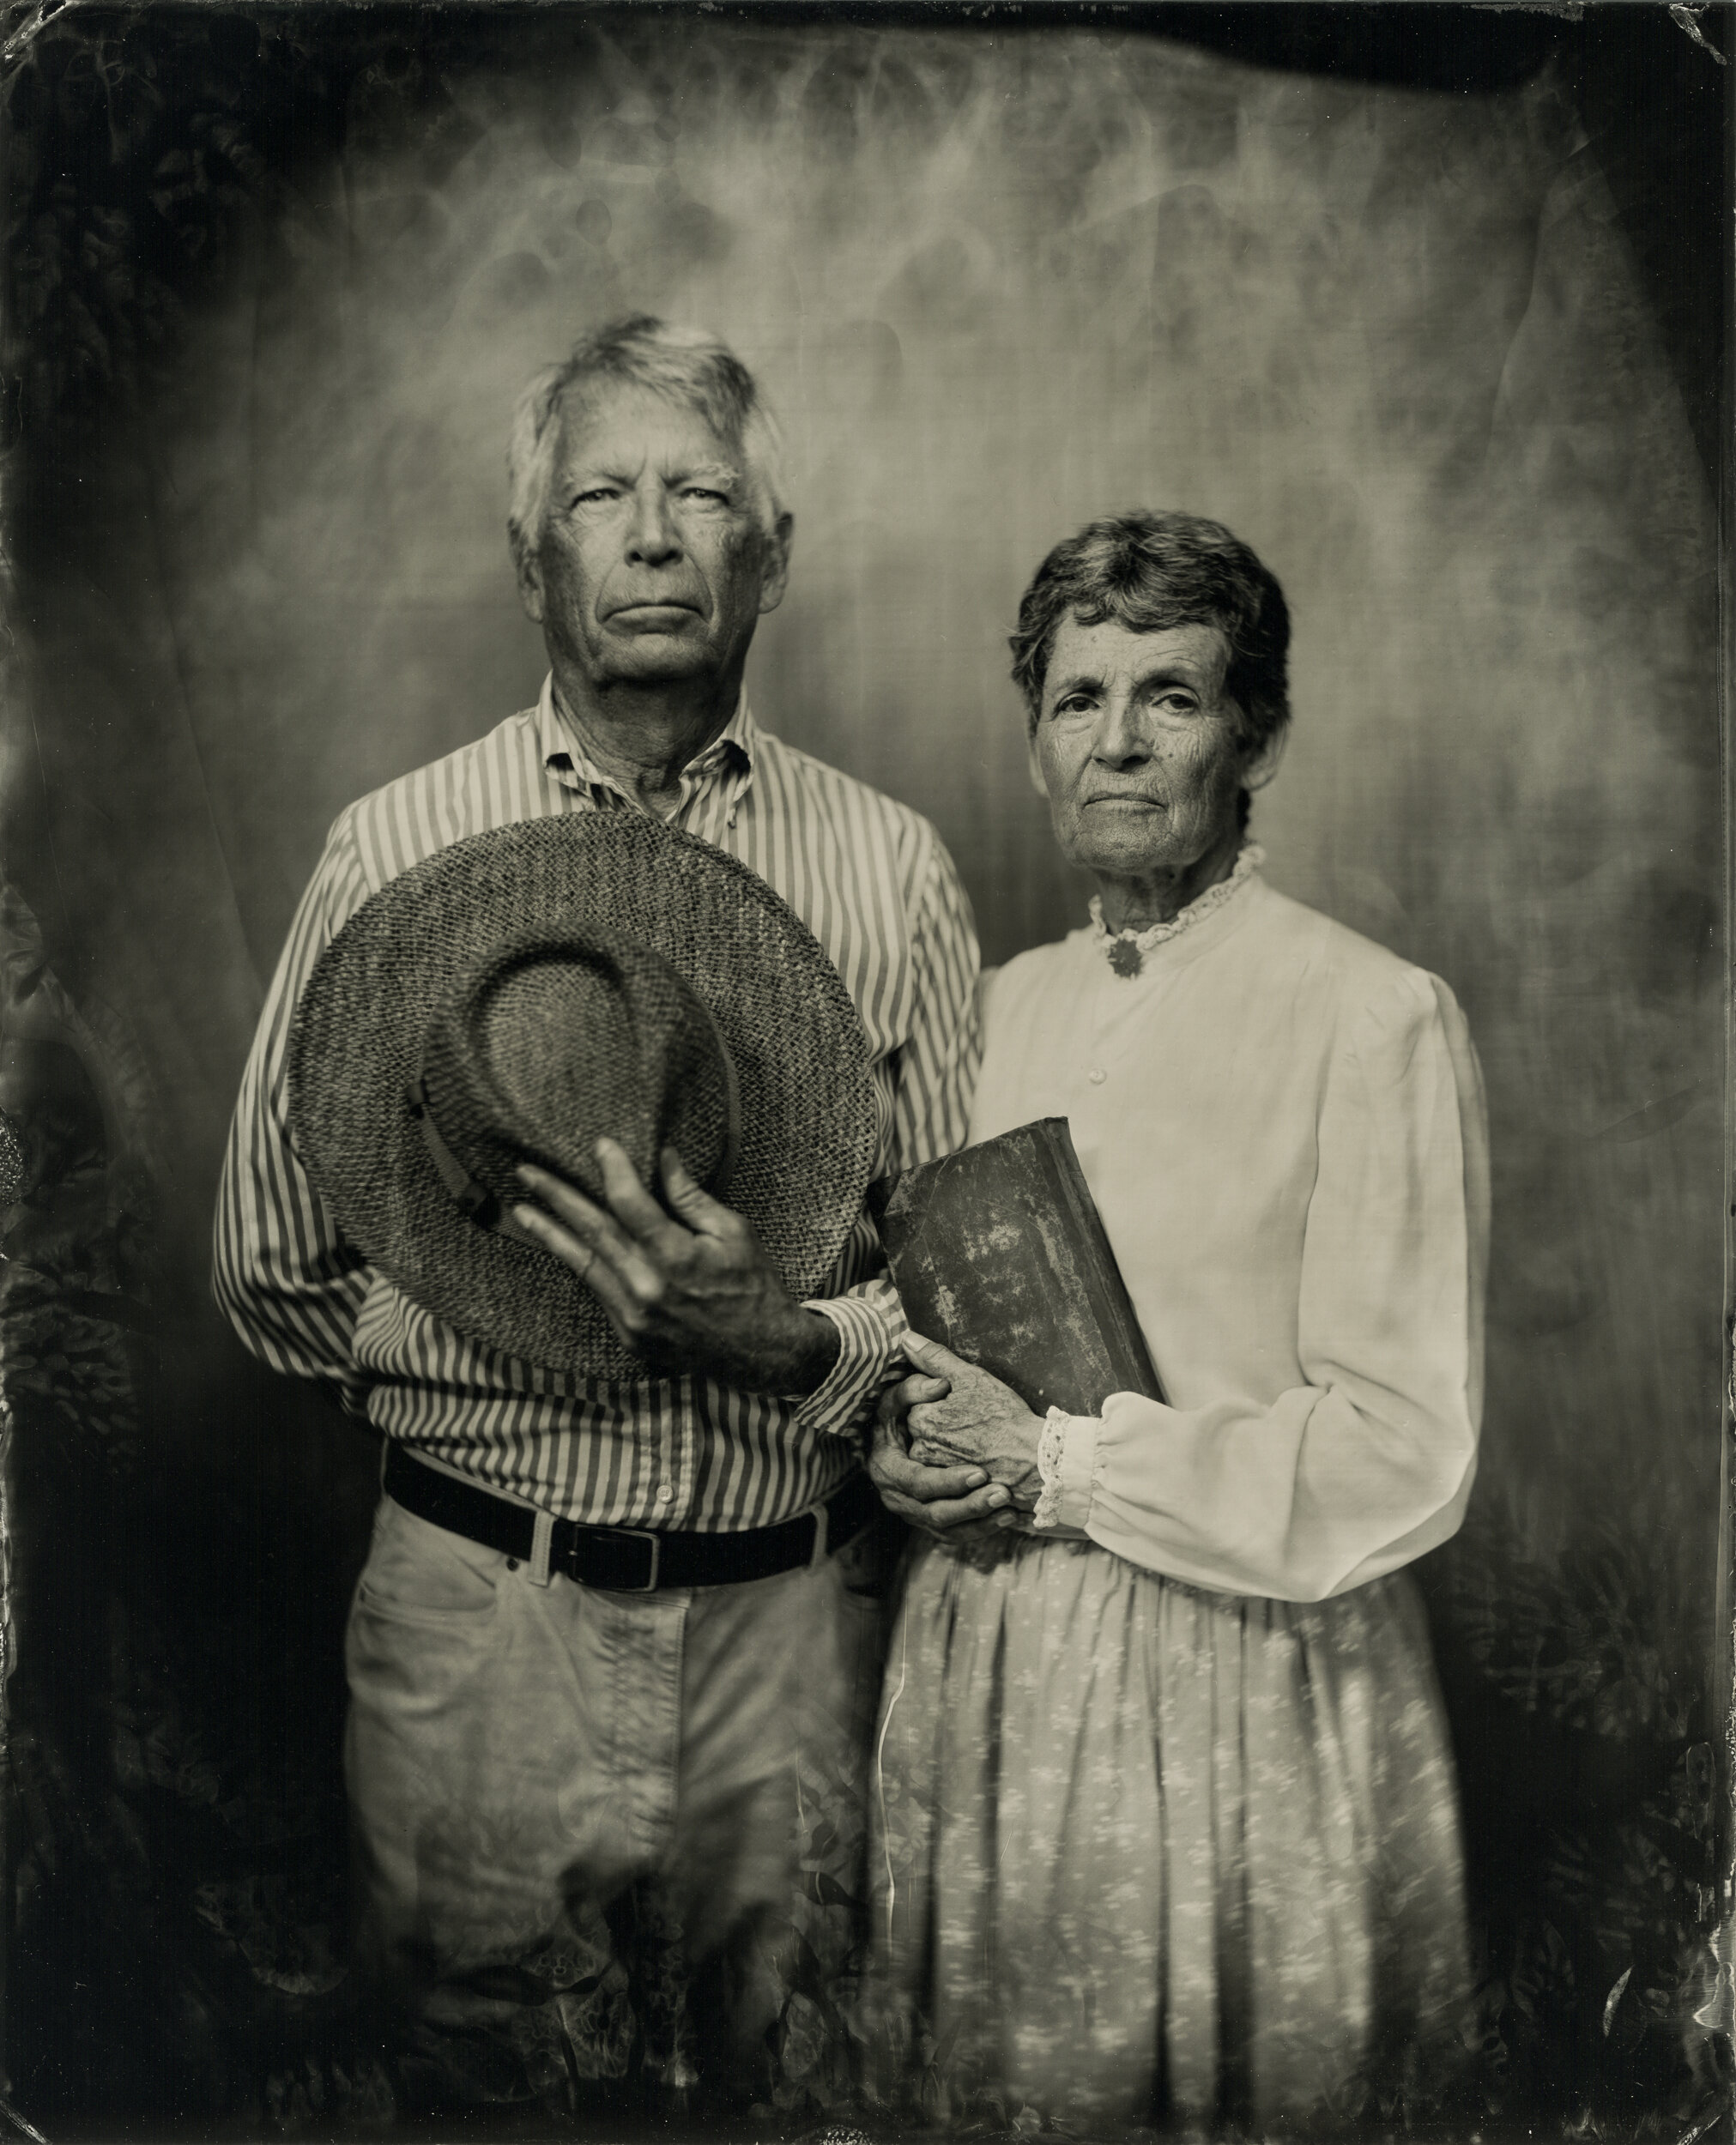 John & Bronwen, Historians, Waterford, Virginia, 2019